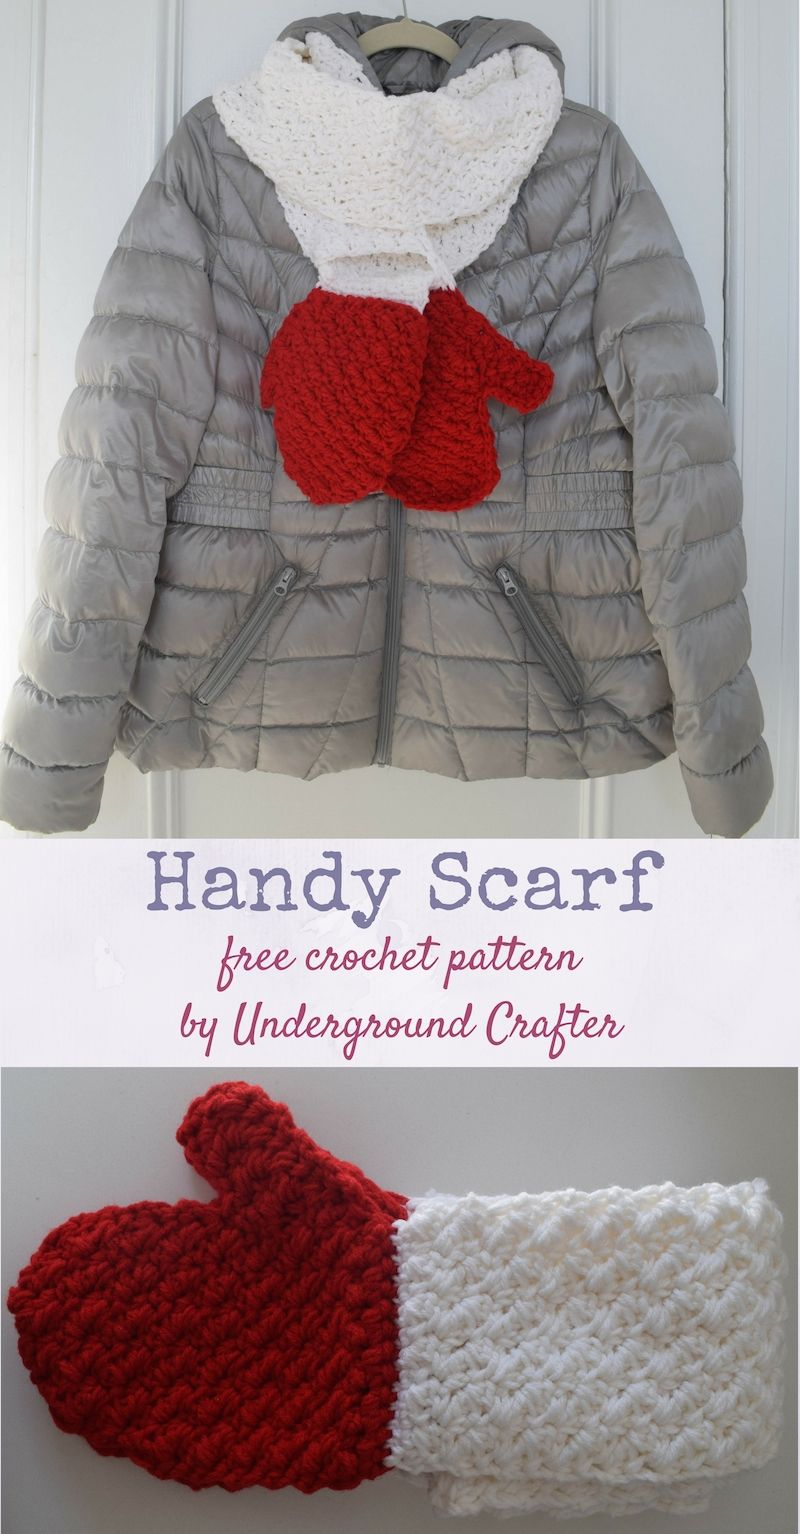 Free Crochet Pattern Handy Scarf In Red Heart Super Saver Yarn